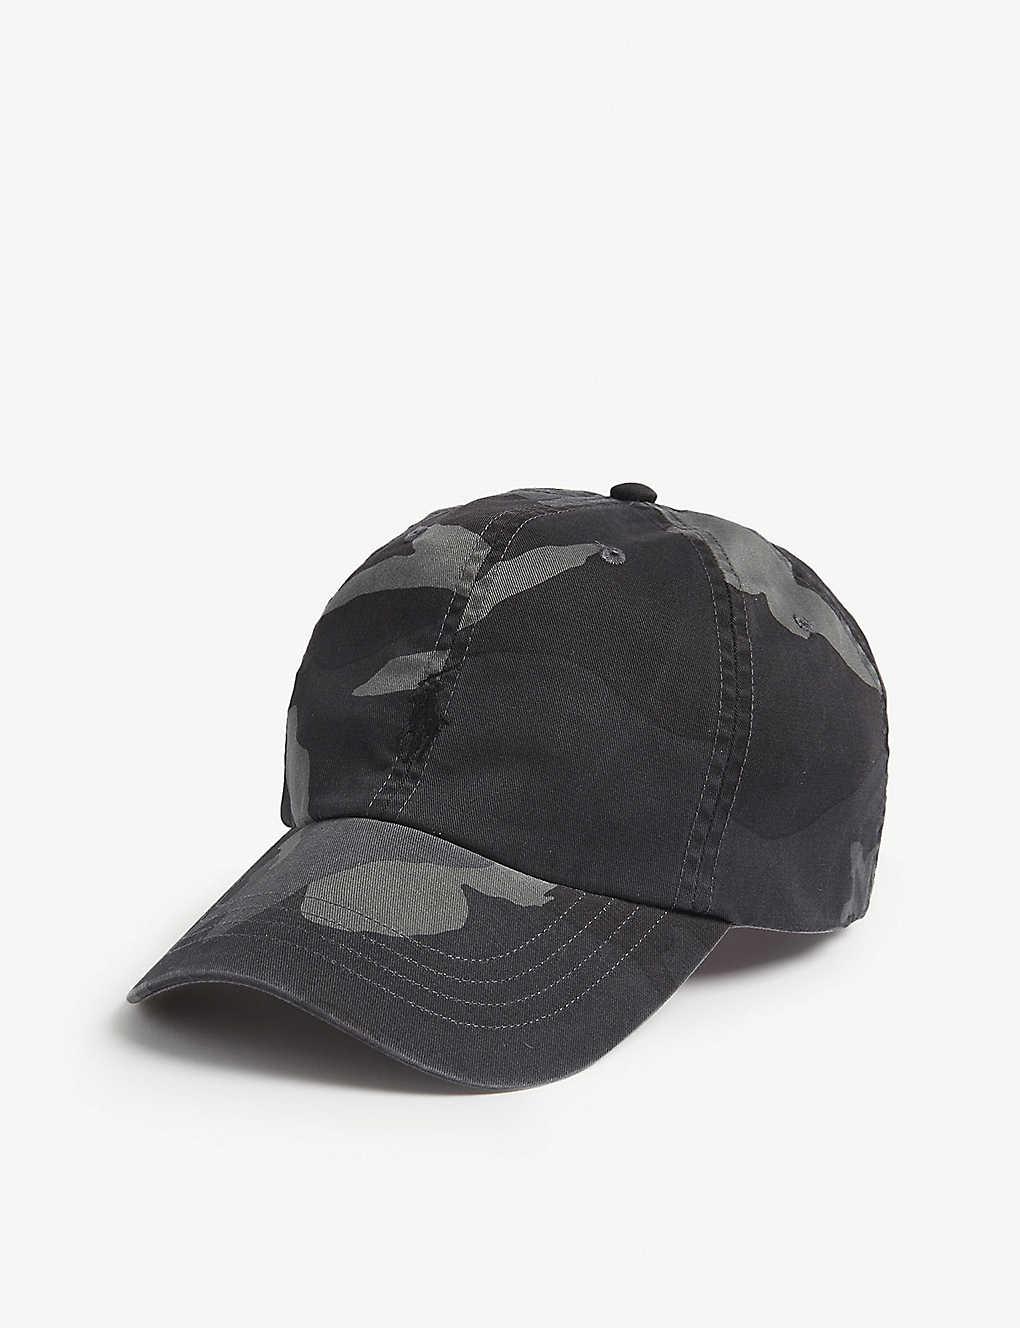 b9a99b95addf0 POLO RALPH LAUREN - Camouflage baseball cap